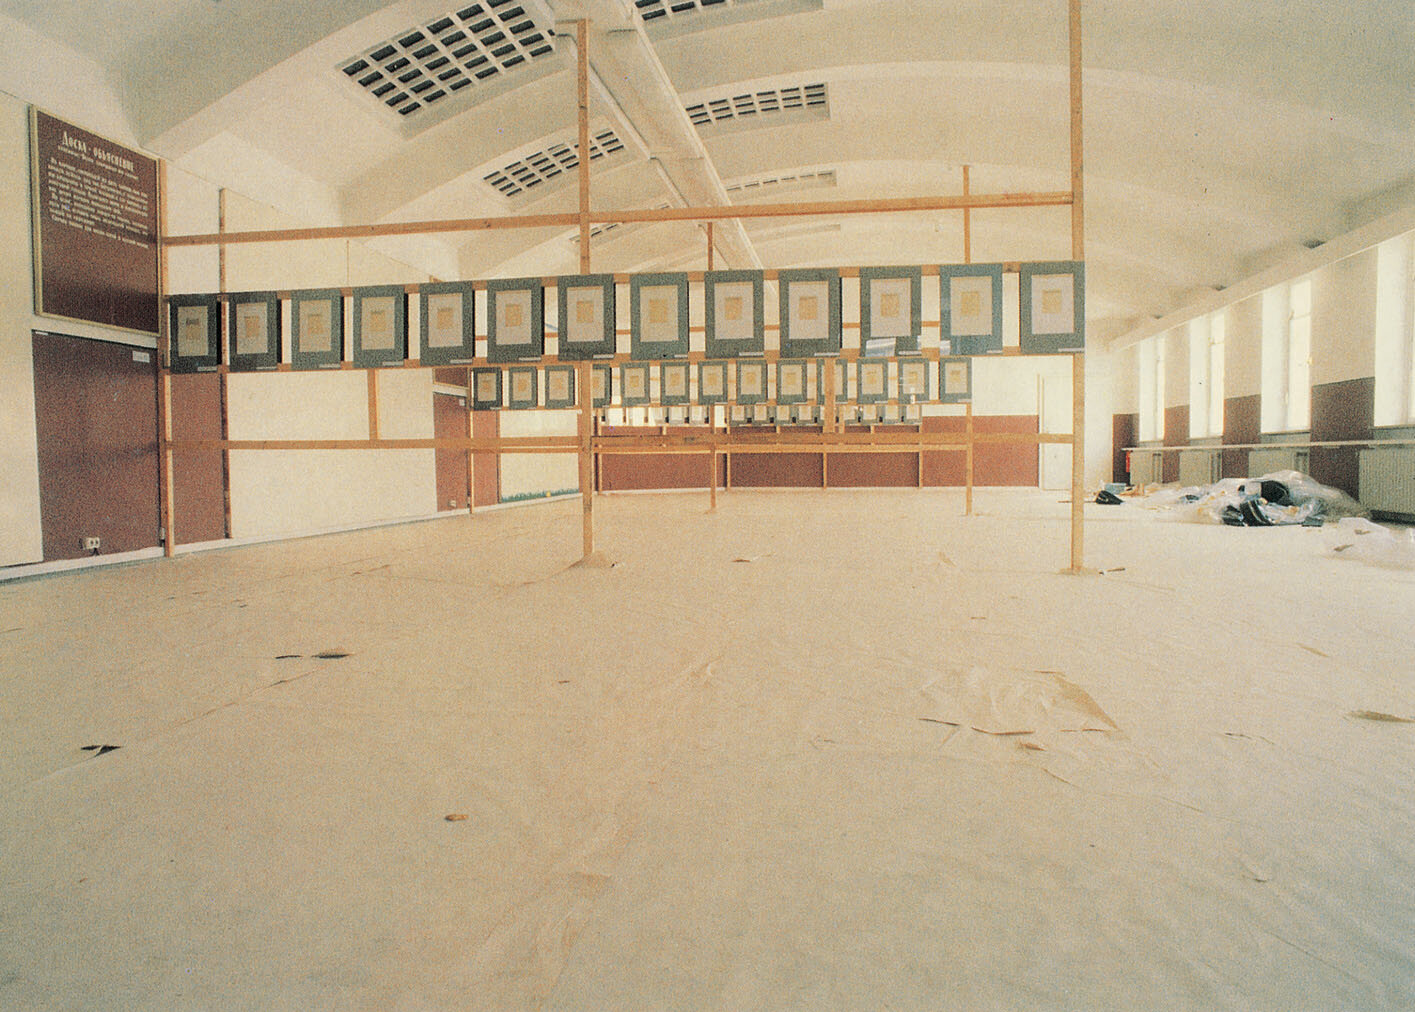 View-of-installation-Kasseler-Kunst-verein-Kassel-1990-Photo-by-Thomas-Rosent.jpg